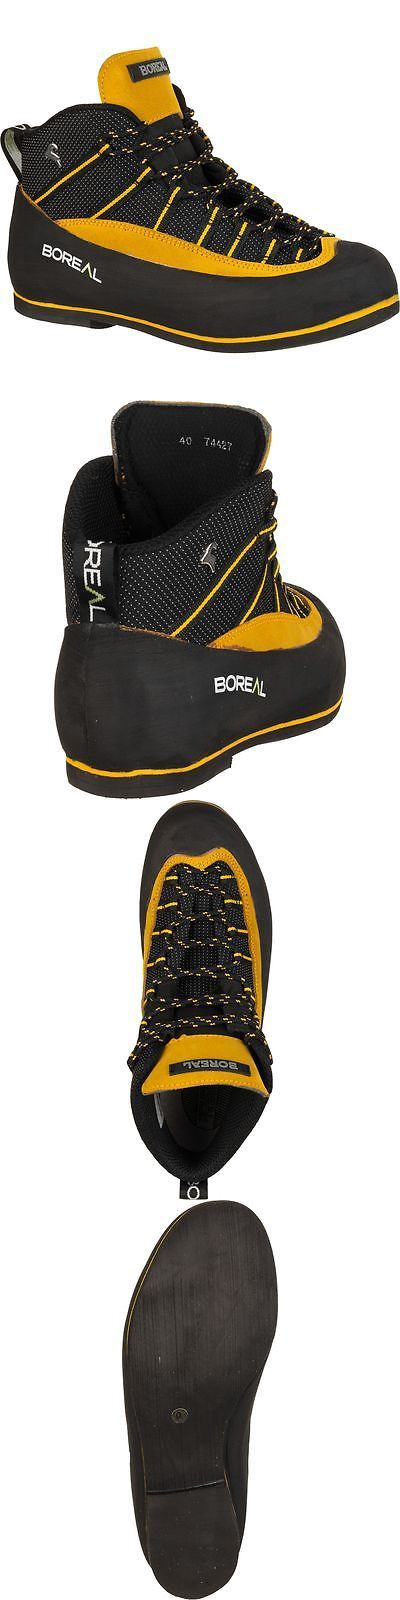 Men 158978: Boreal Big Wall Climbing Shoe BUY IT NOW ONLY: $184.95